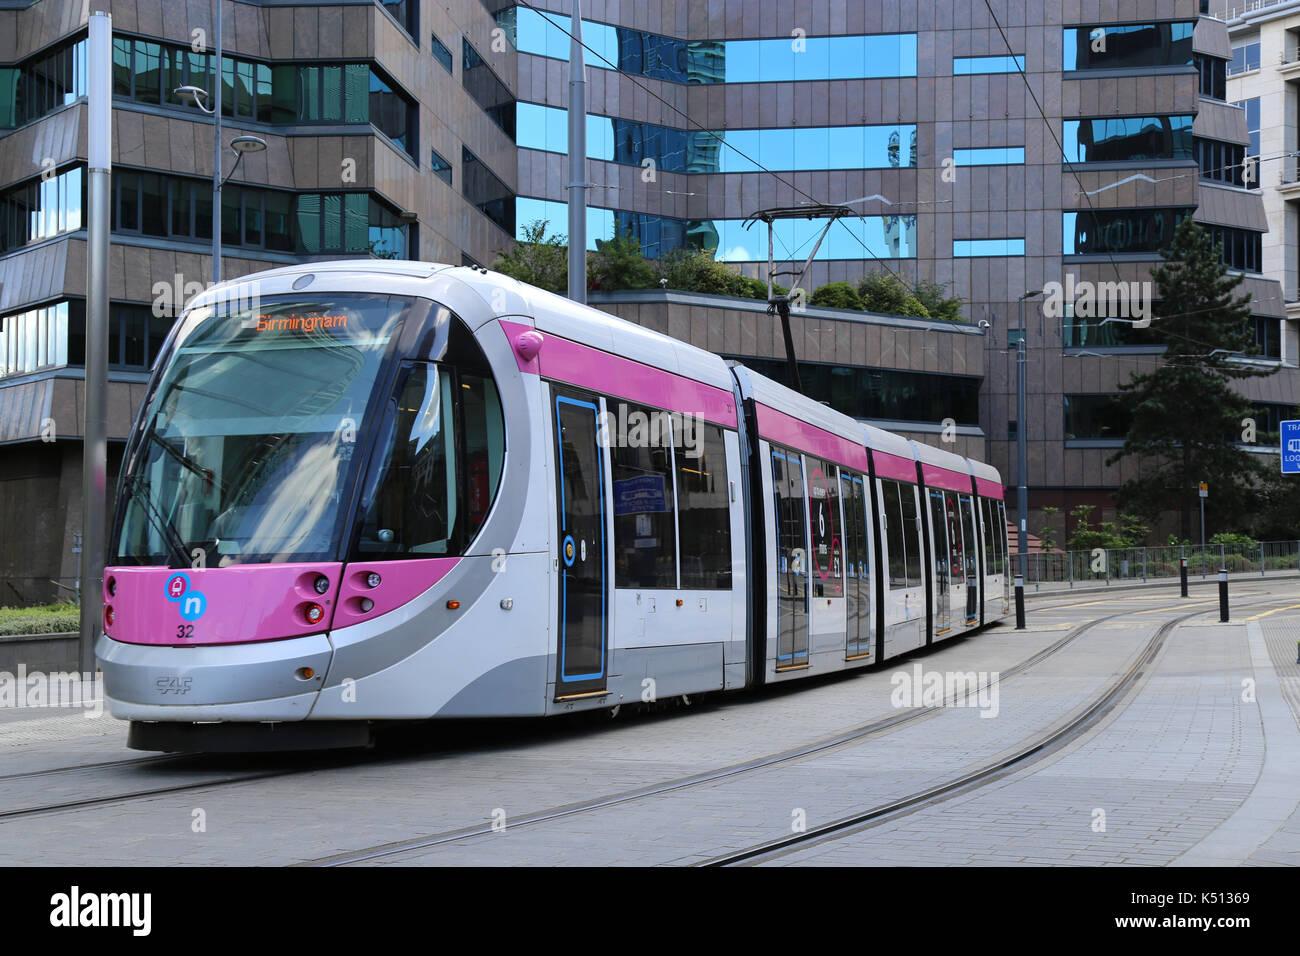 Midland Metro tram service arriving in Birmingham city centre, West Midlands, UK. - Stock Image